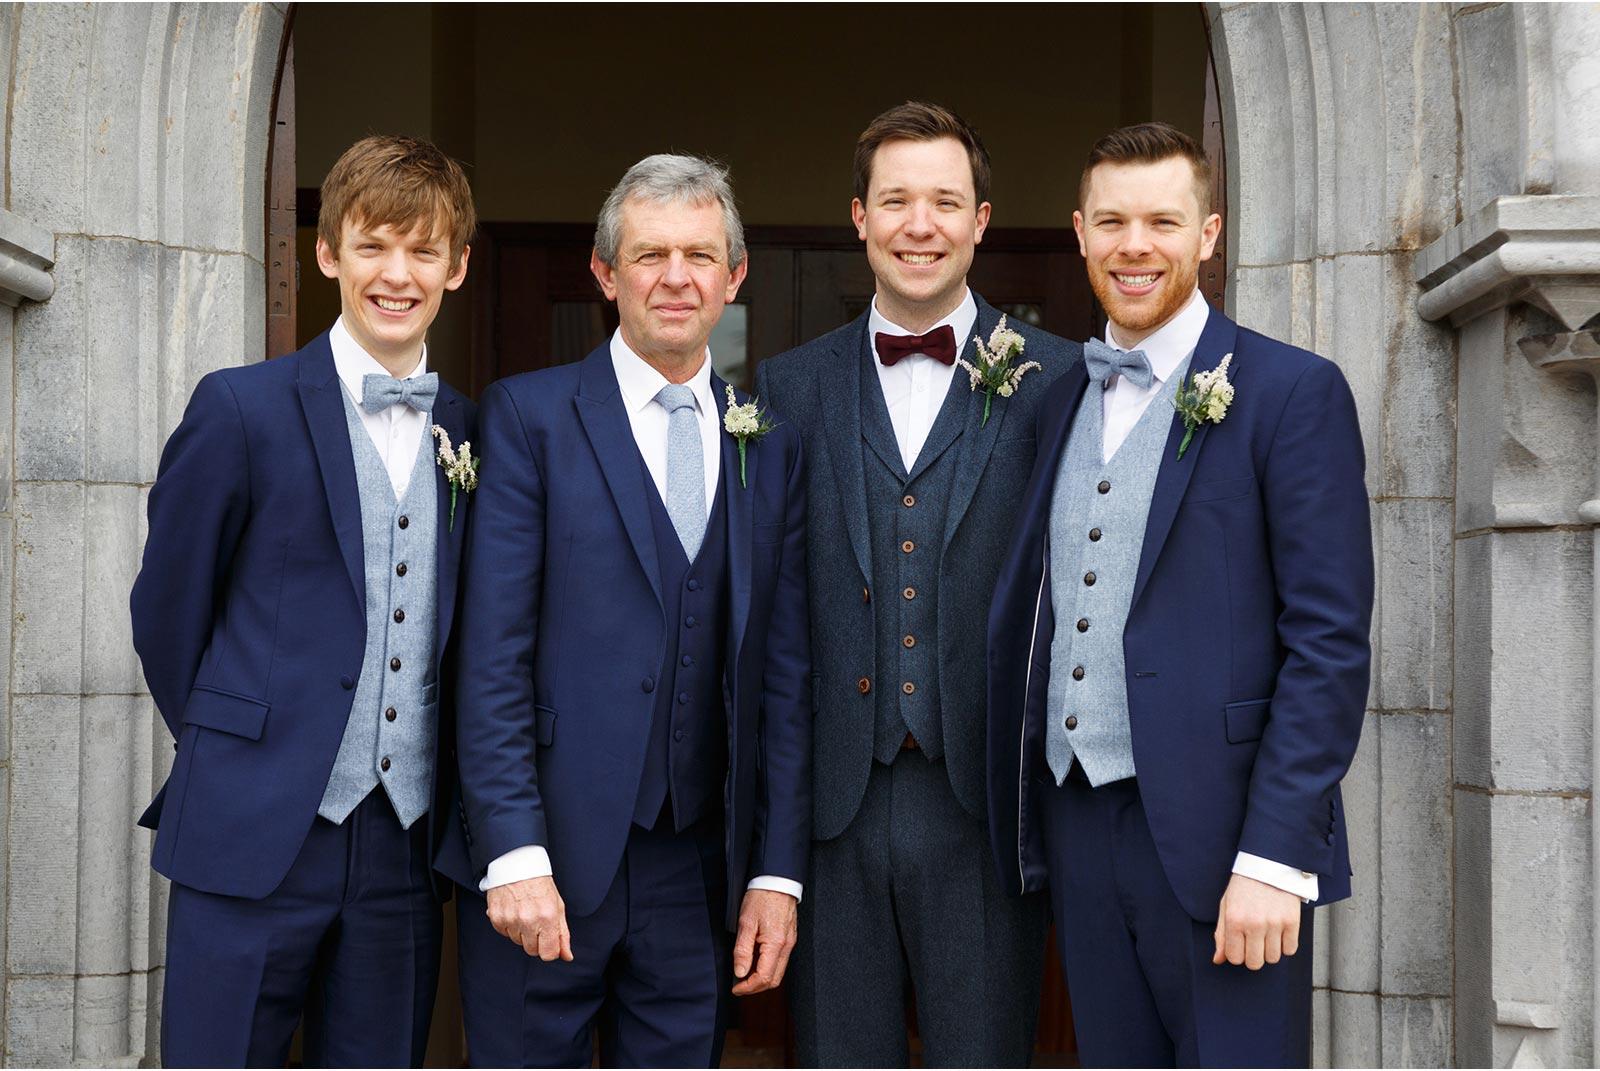 Groom and his grooms men